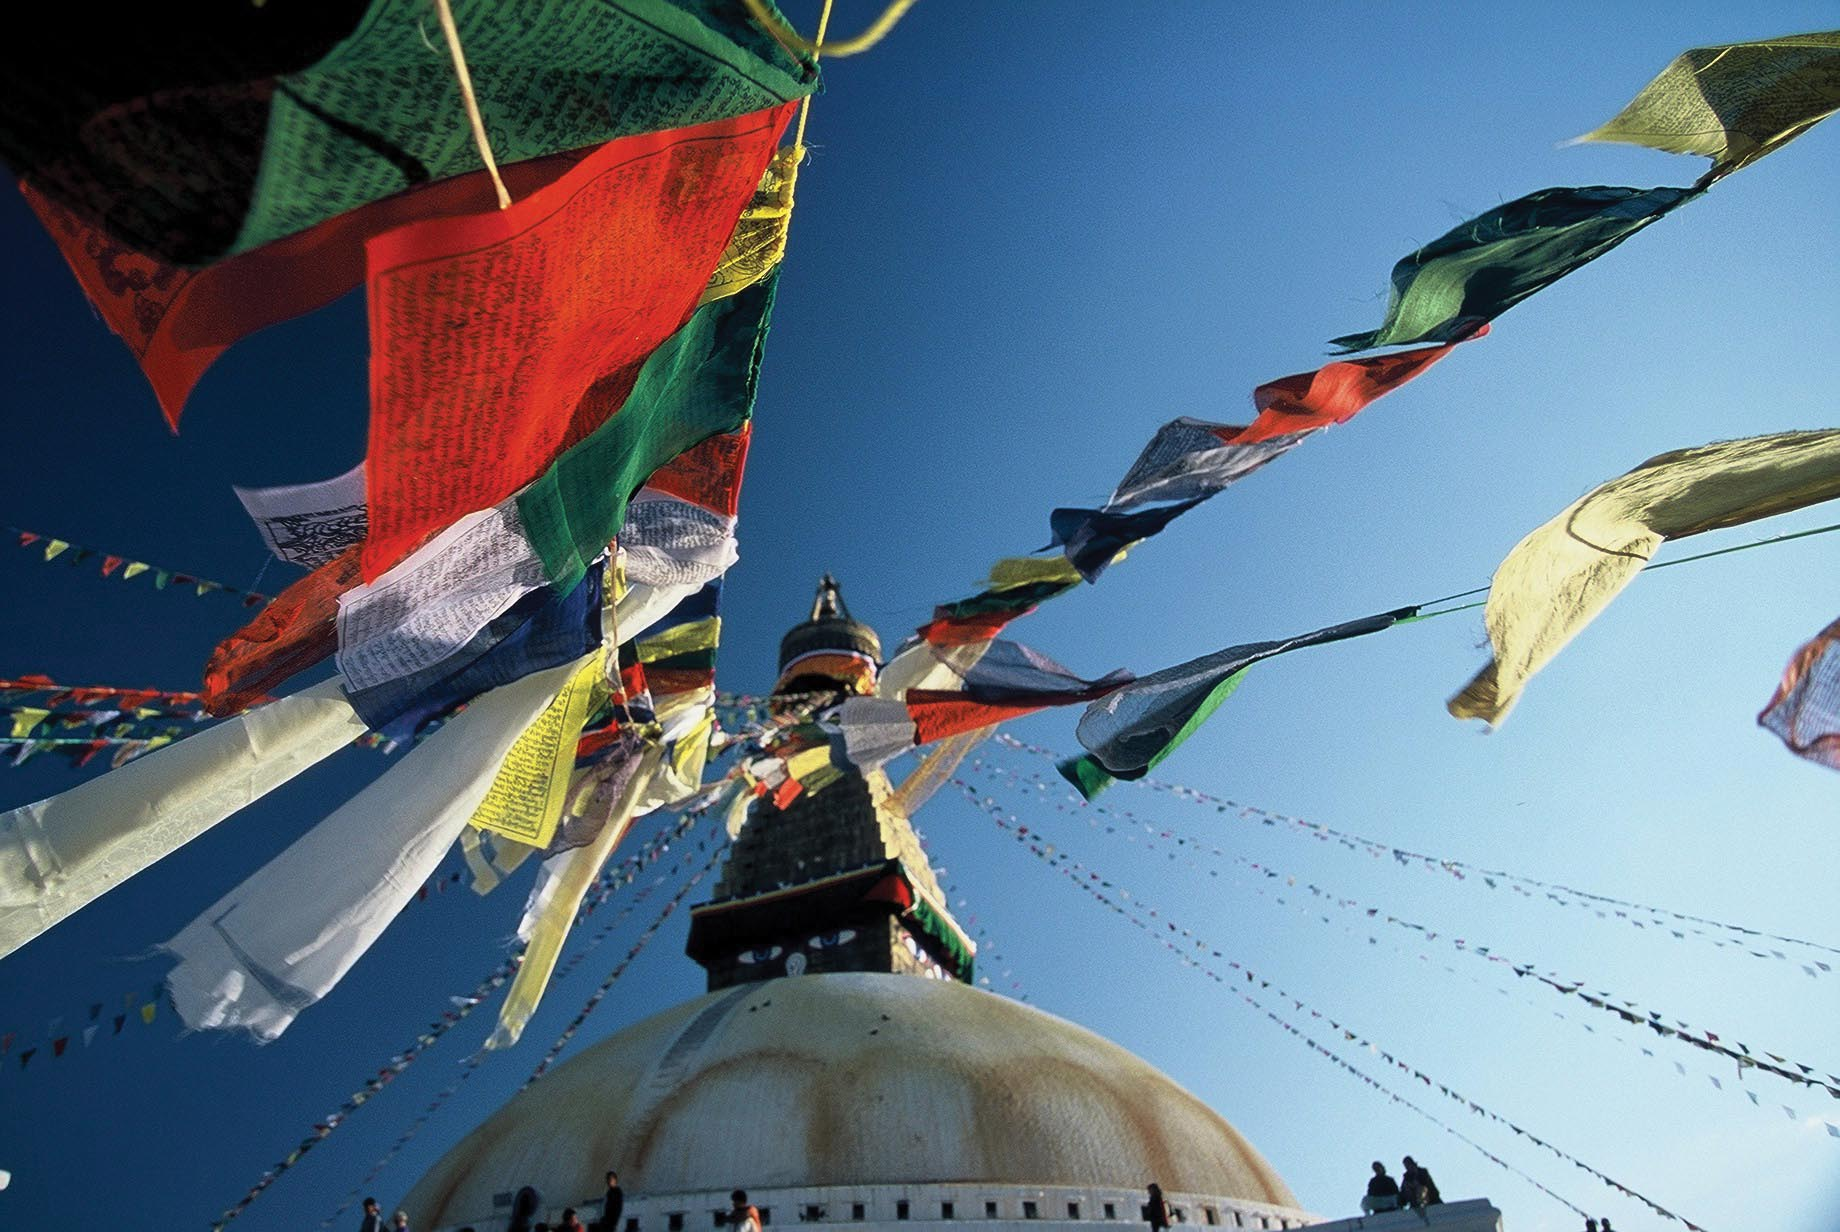 Kathmandu Experience - Independent 2